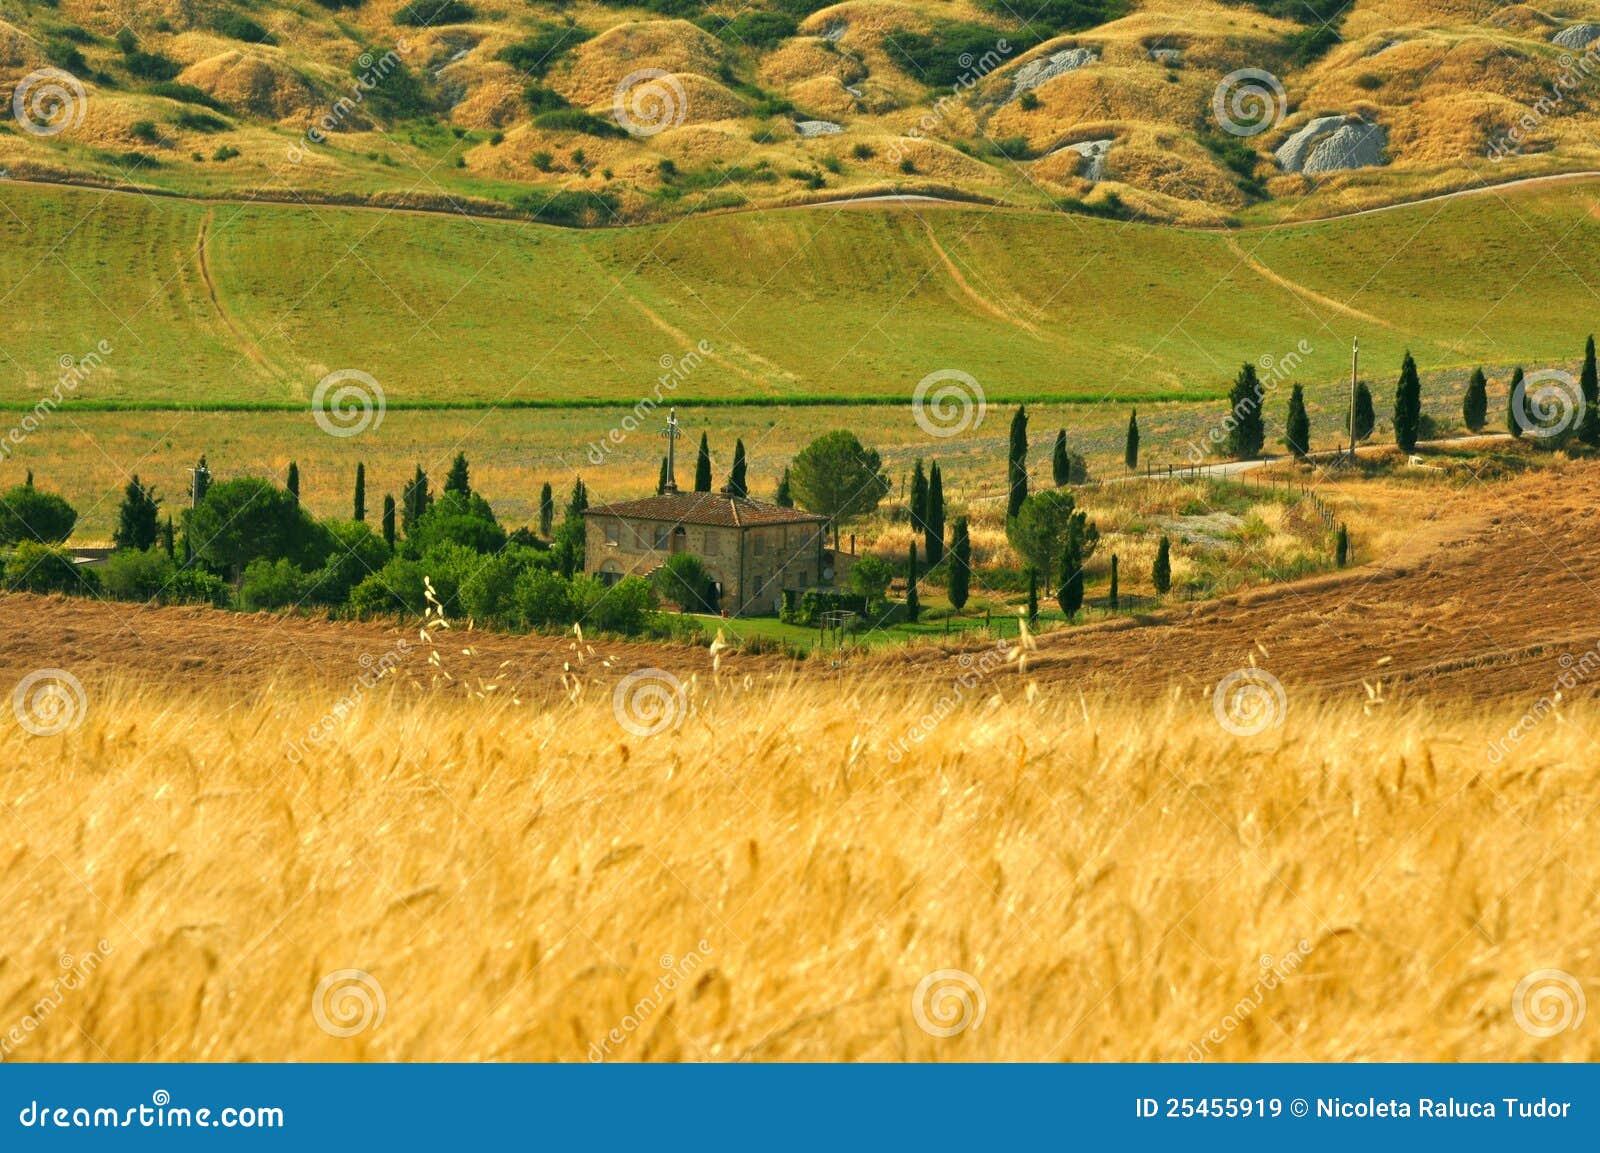 Weizenfelder in Toskana, Italien